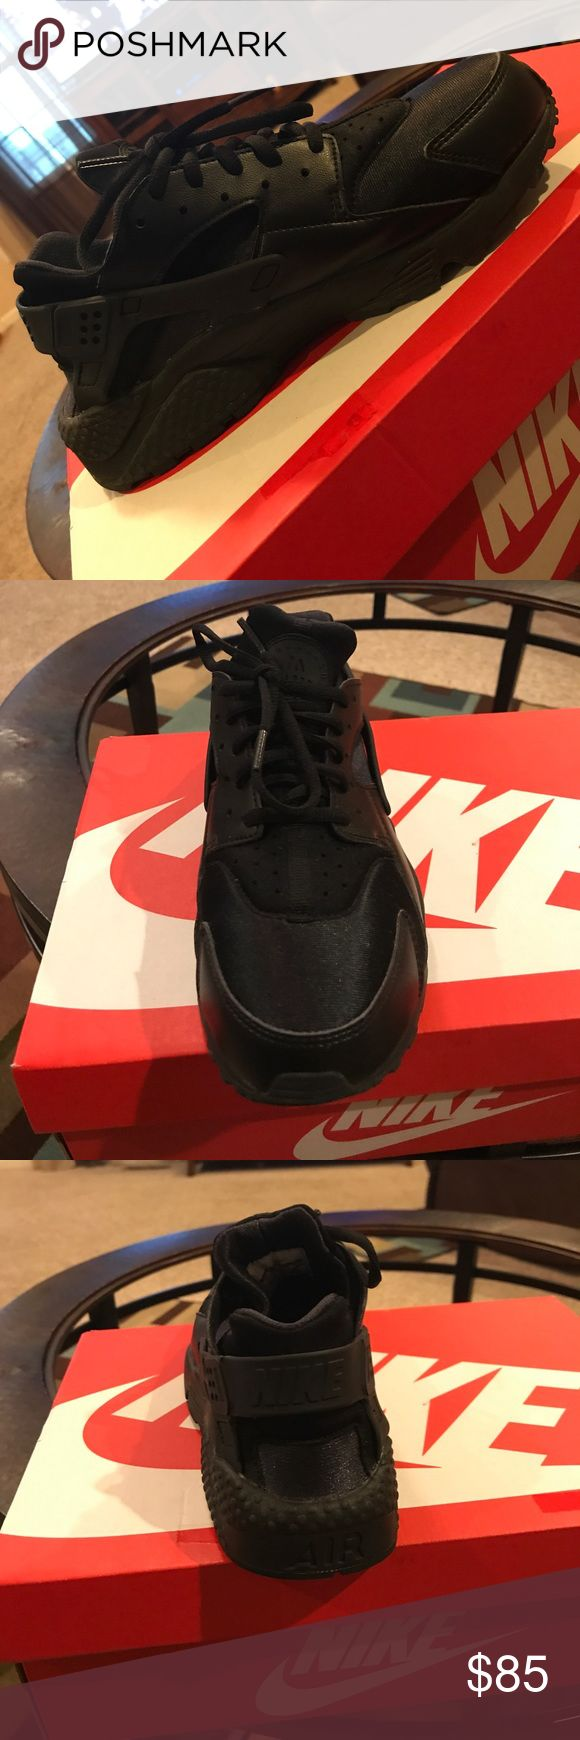 All black Nike Huaraches shoes All black Nike Huaraches! Nike Shoes Athletic Shoes